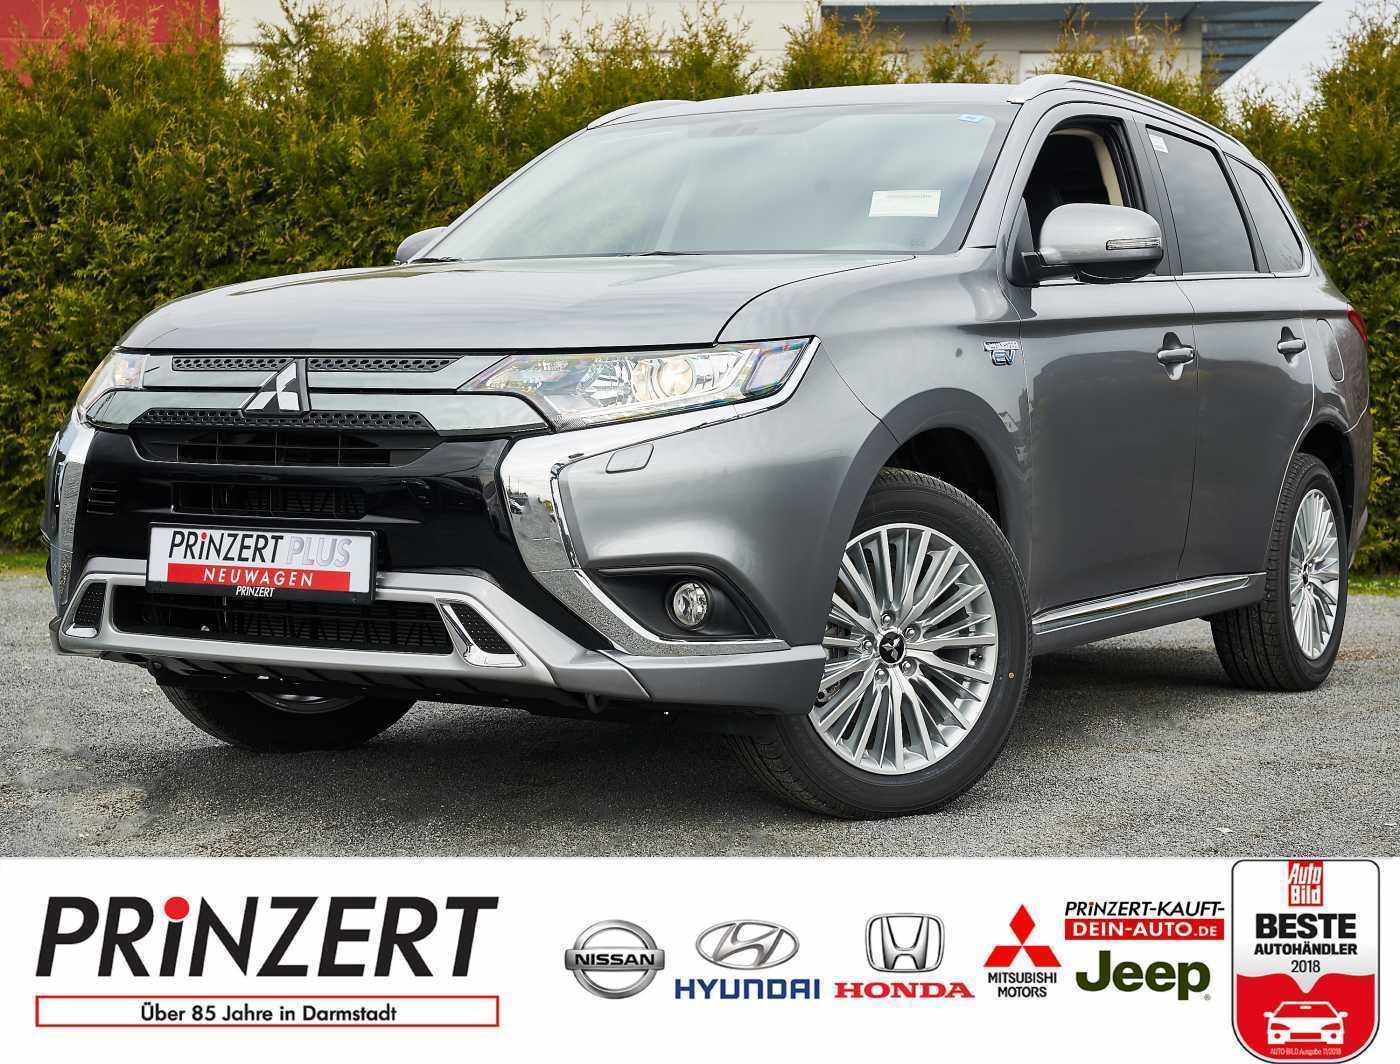 Mitsubishi Plug-in Hybrid Outlander 2.4 4WD 'Plus' Diamant Edition inkl. Staatl. Förderung, Jahr 2020, Hybrid